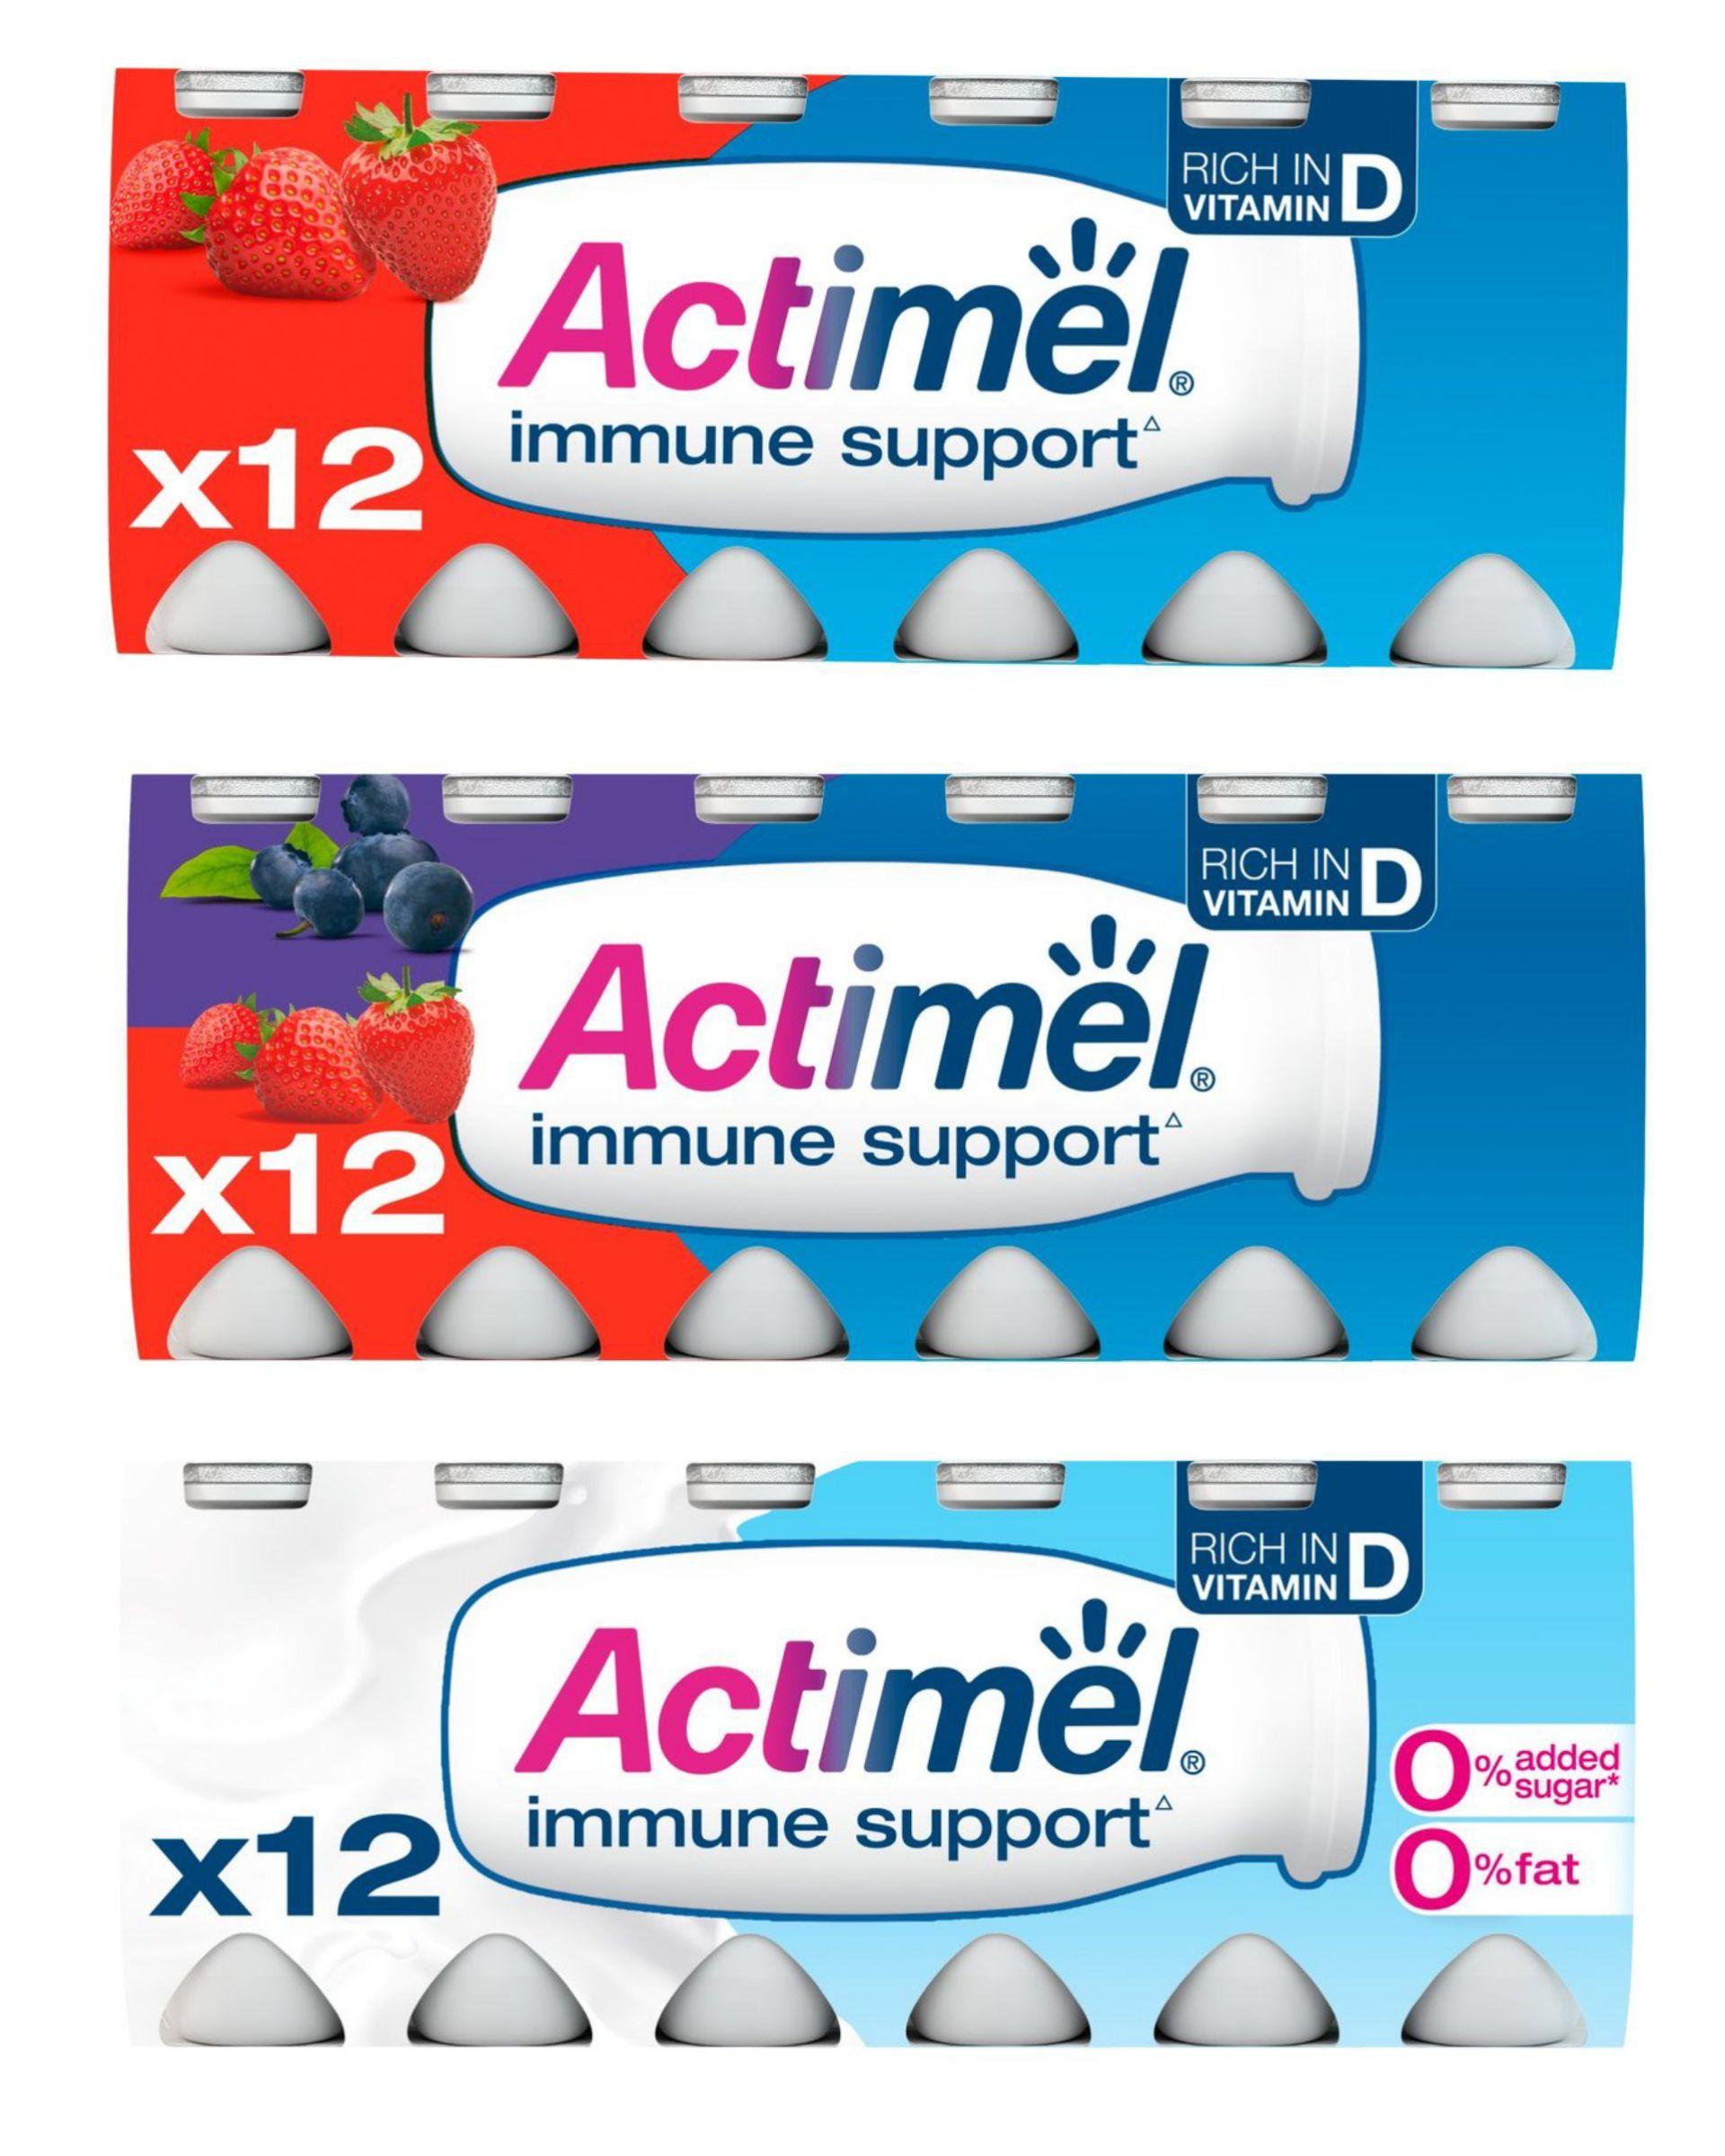 Actimel Strawberry / Strawberry & blueberry / 0% fat original Yogurt Drinks12 x 100g £2 @ Morrisons